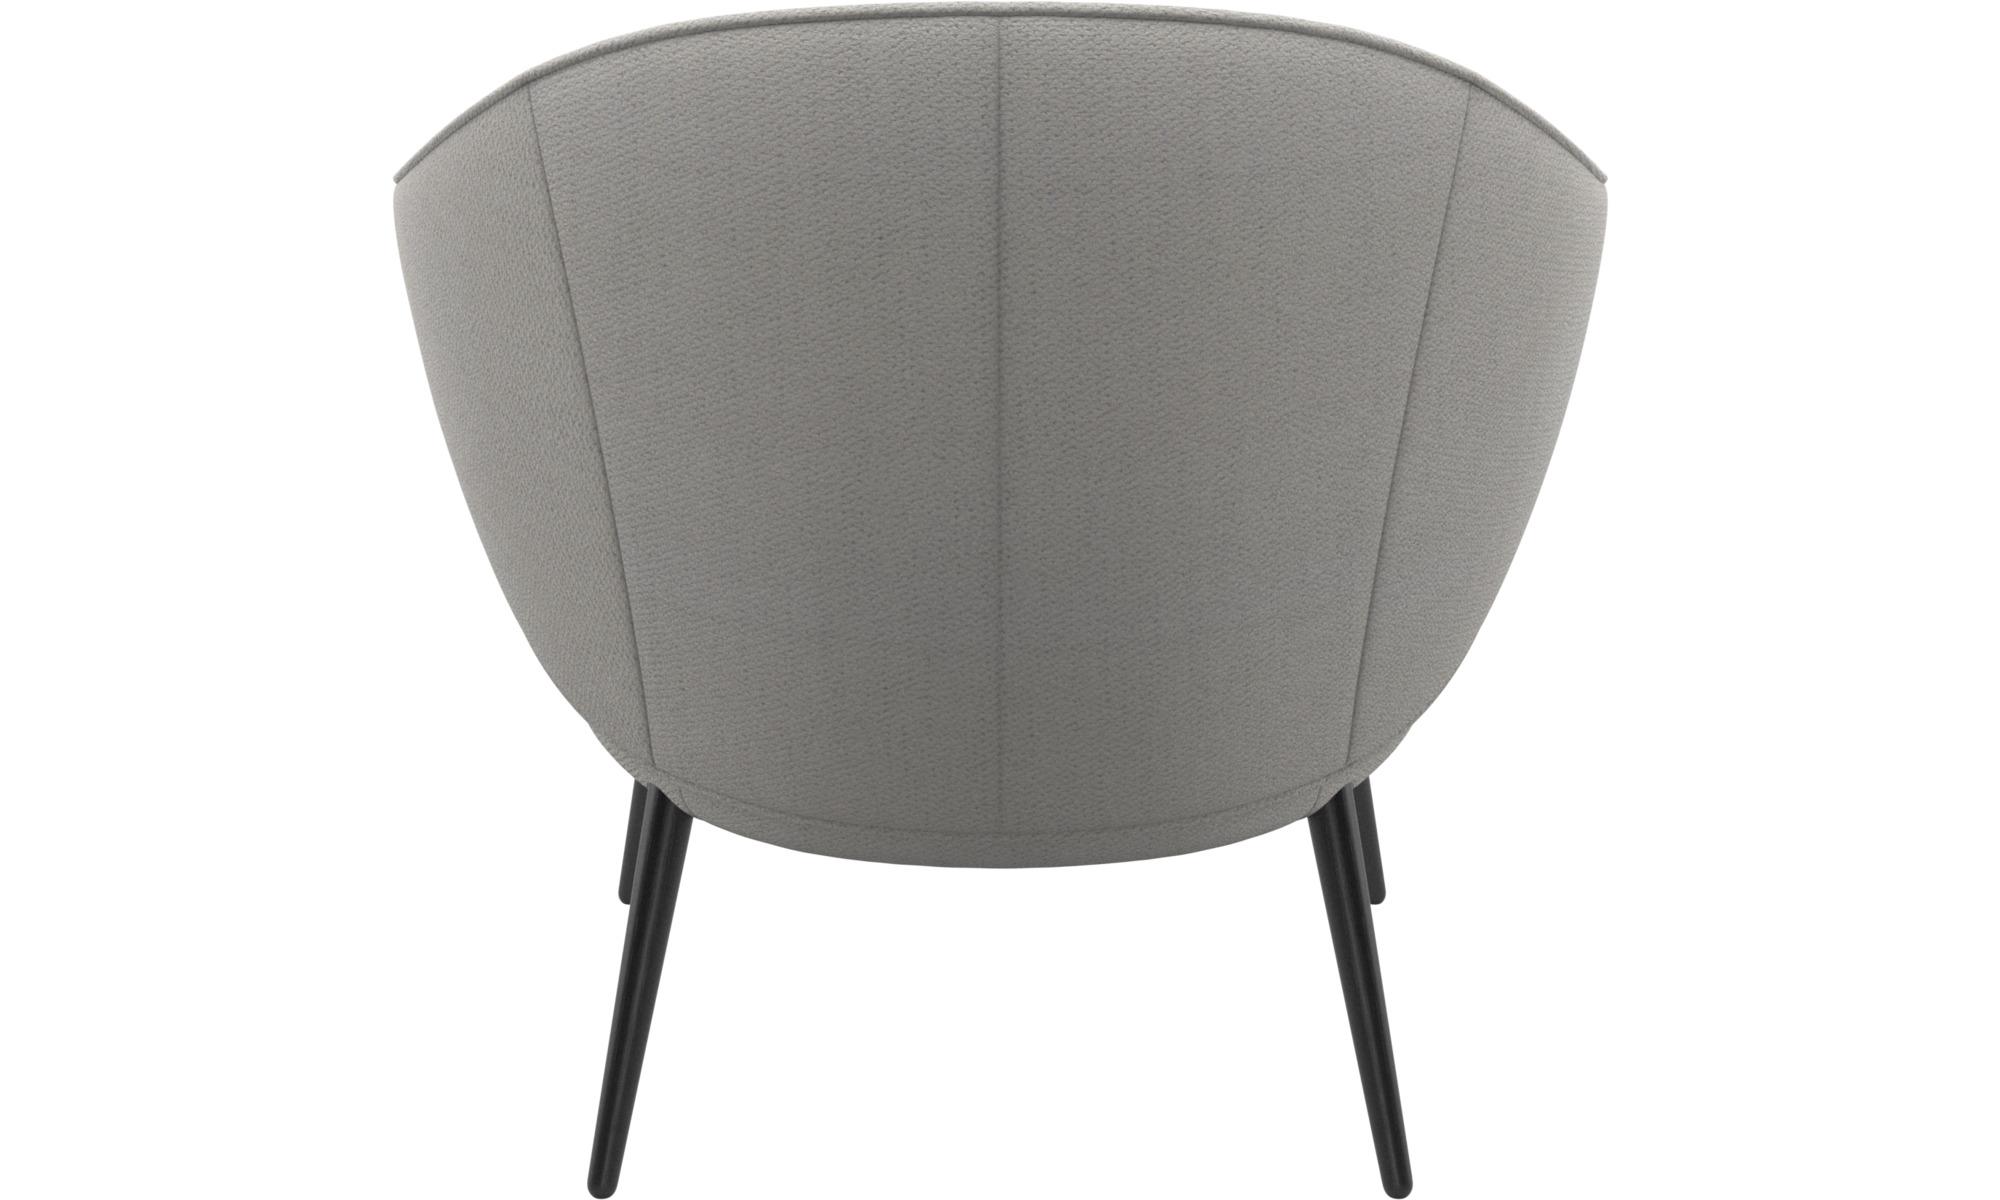 Armchairs - Charlotte chair - BoConcept